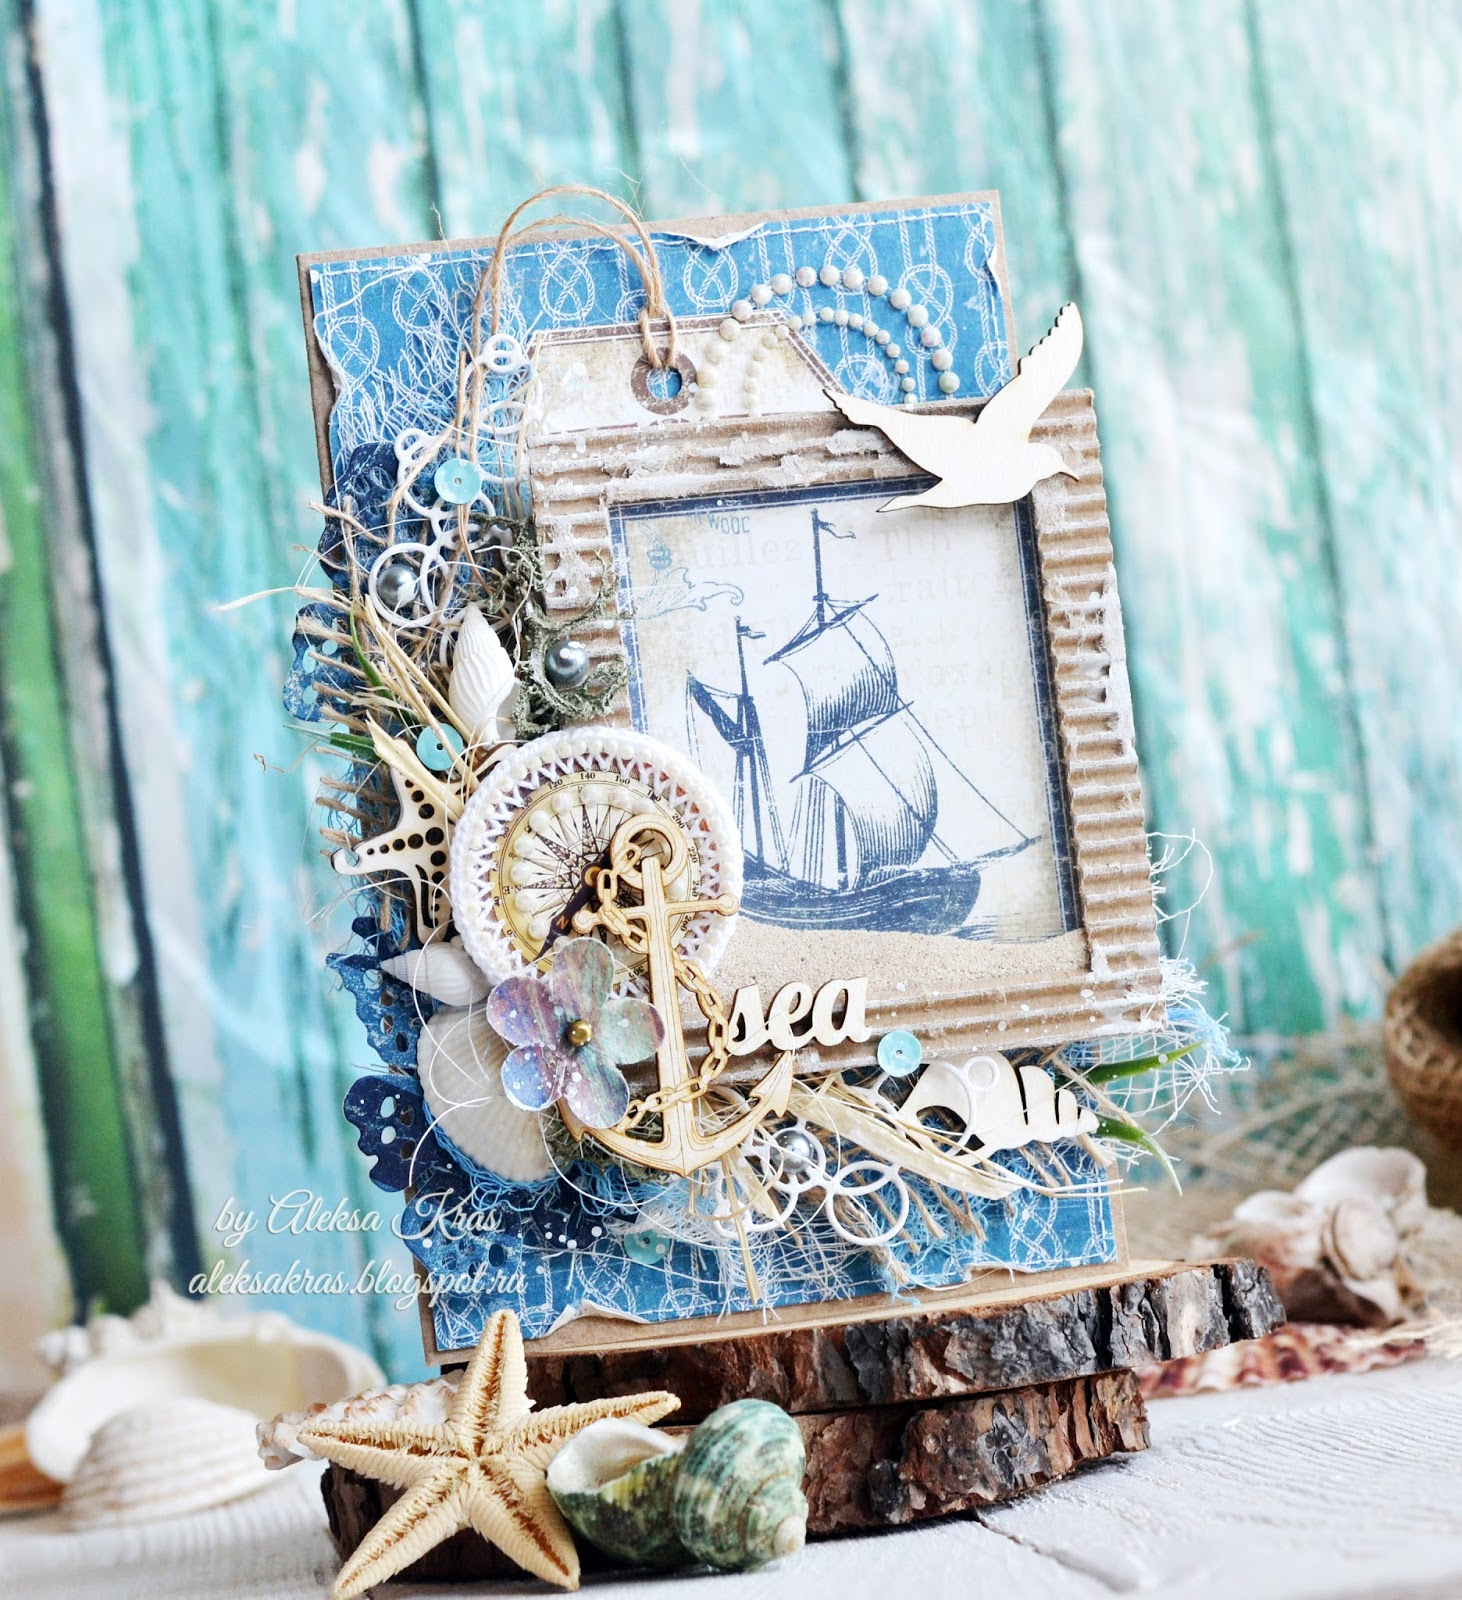 Открытка морская тематика фото, фото красивые места